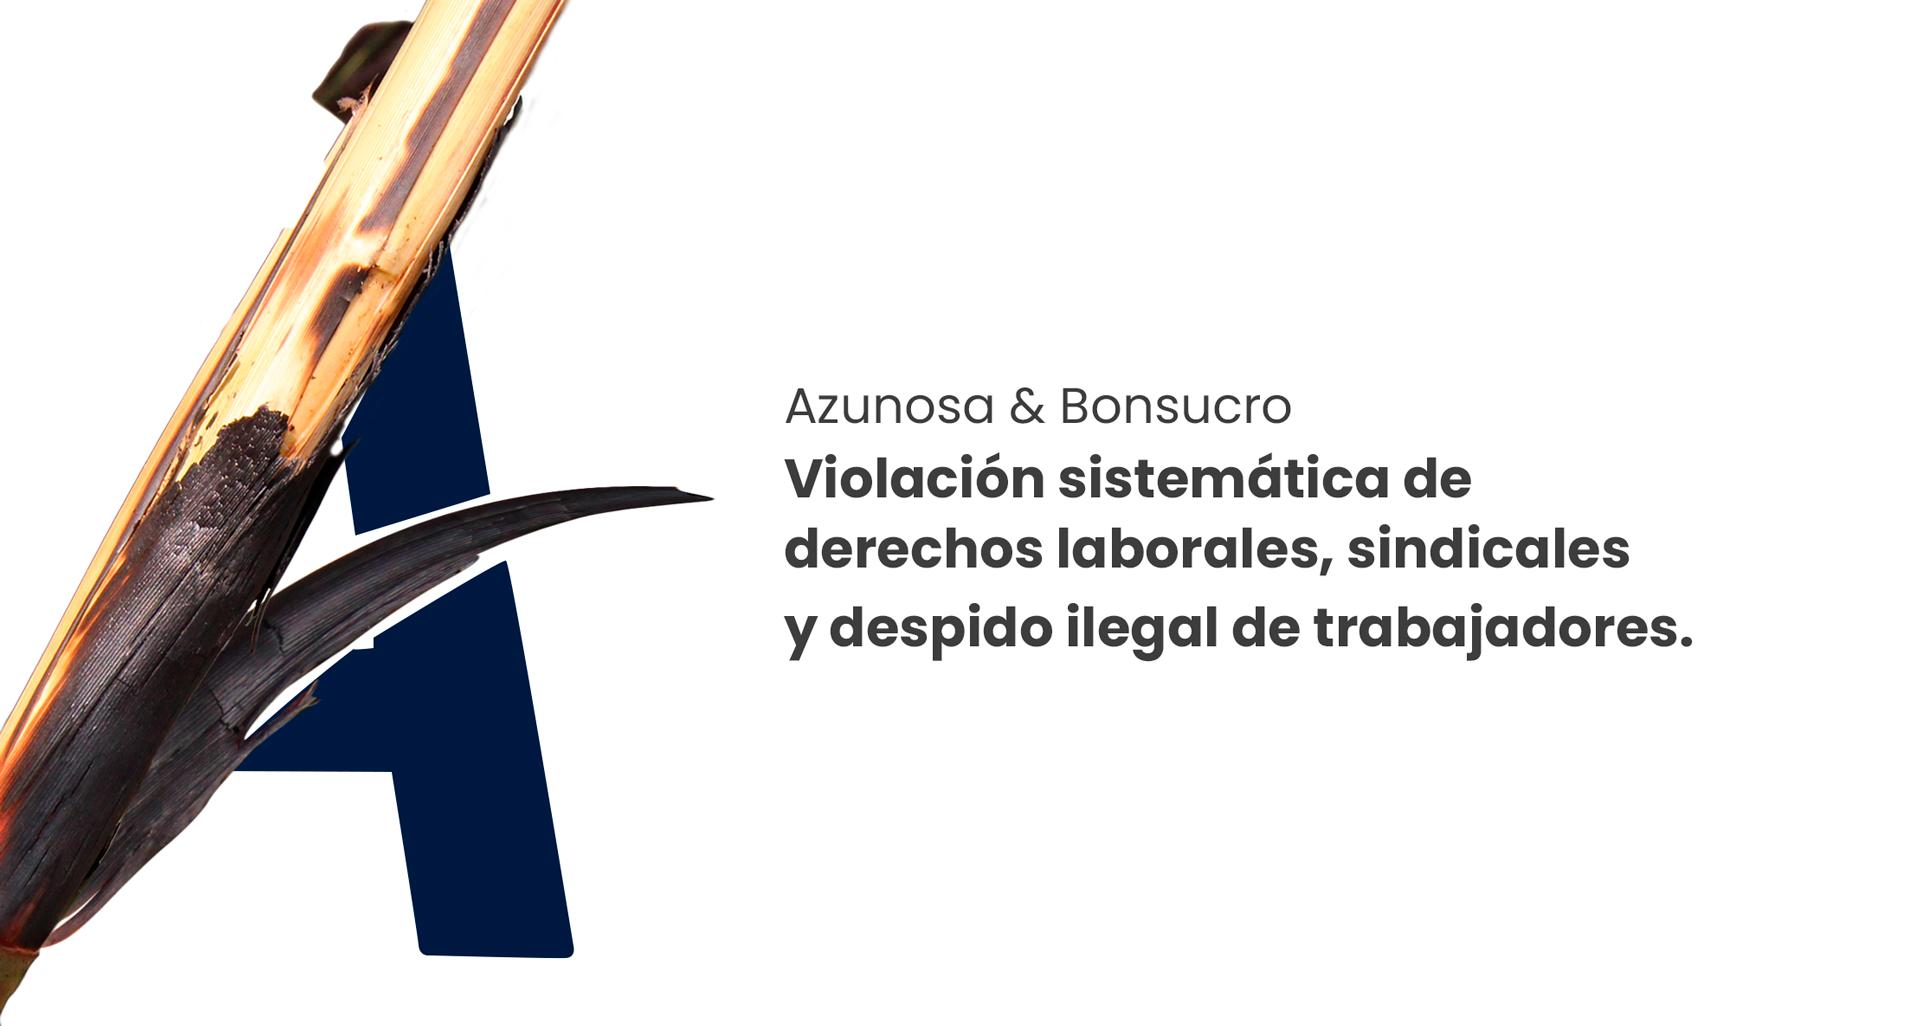 20200924_CabezalBonsucro